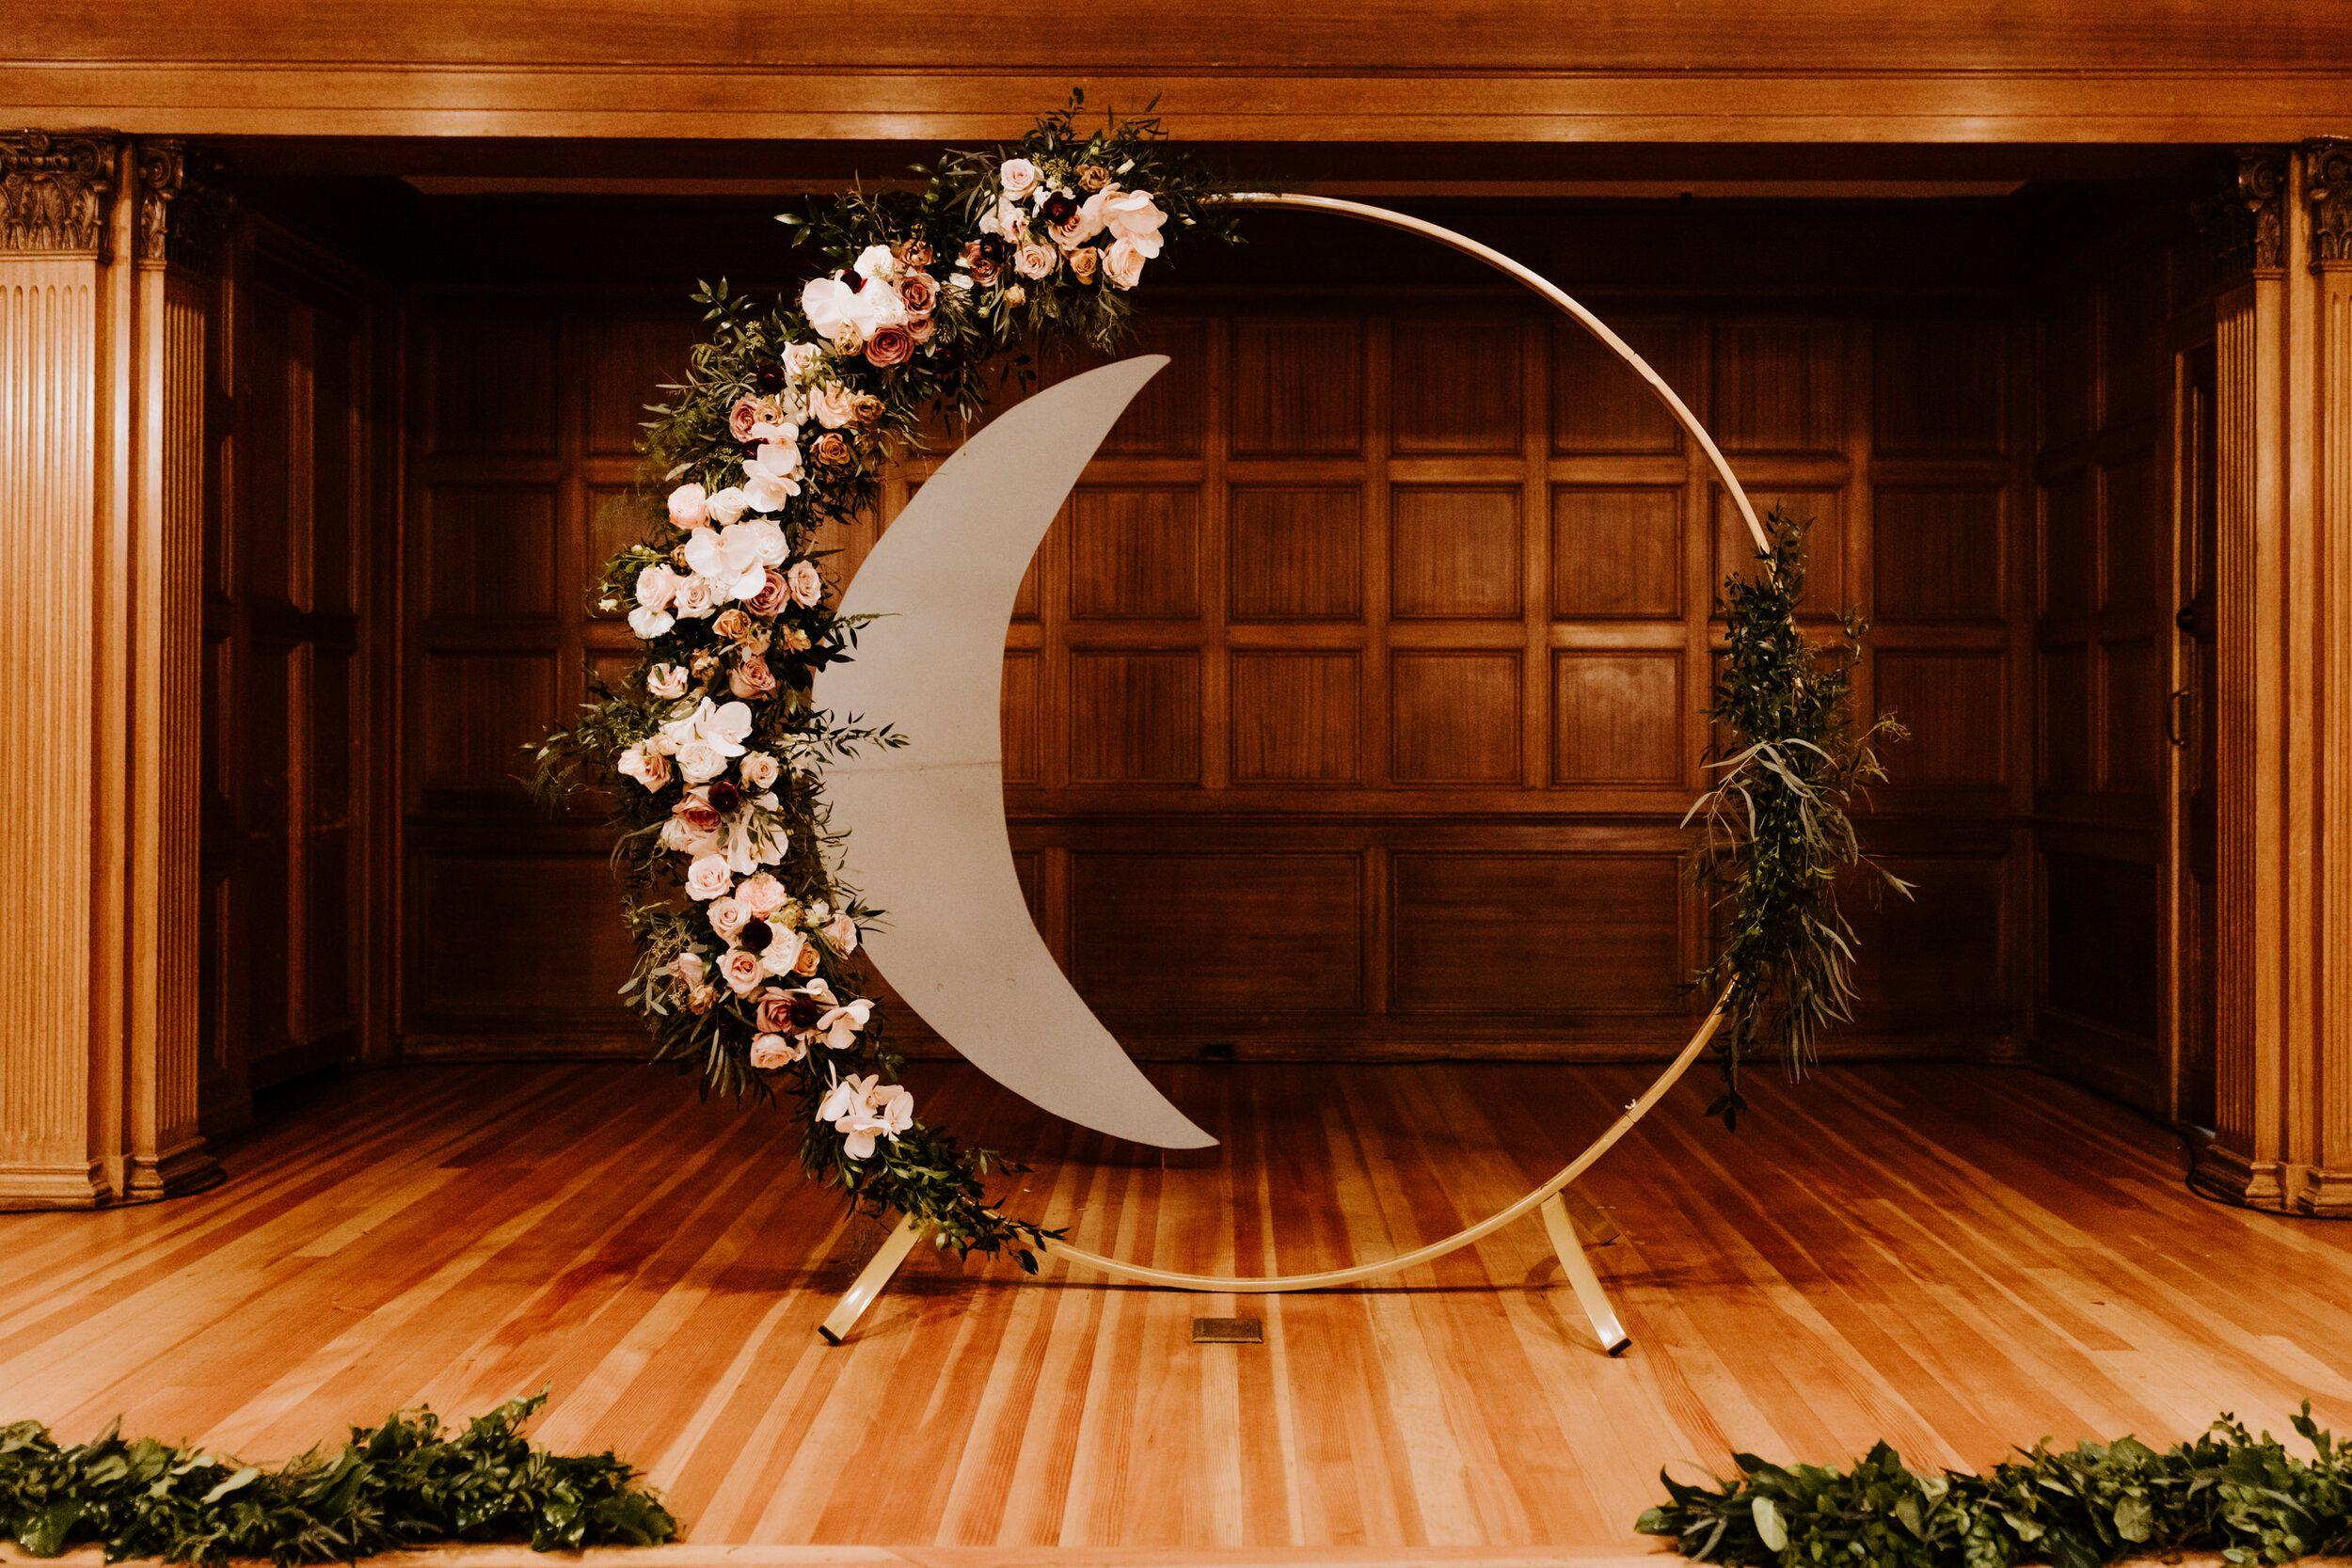 The Loft On Pine Wedding In Long Beach Tida Svy In 2020 Moon Wedding Theme Moon Wedding Palm Springs Wedding Photographer